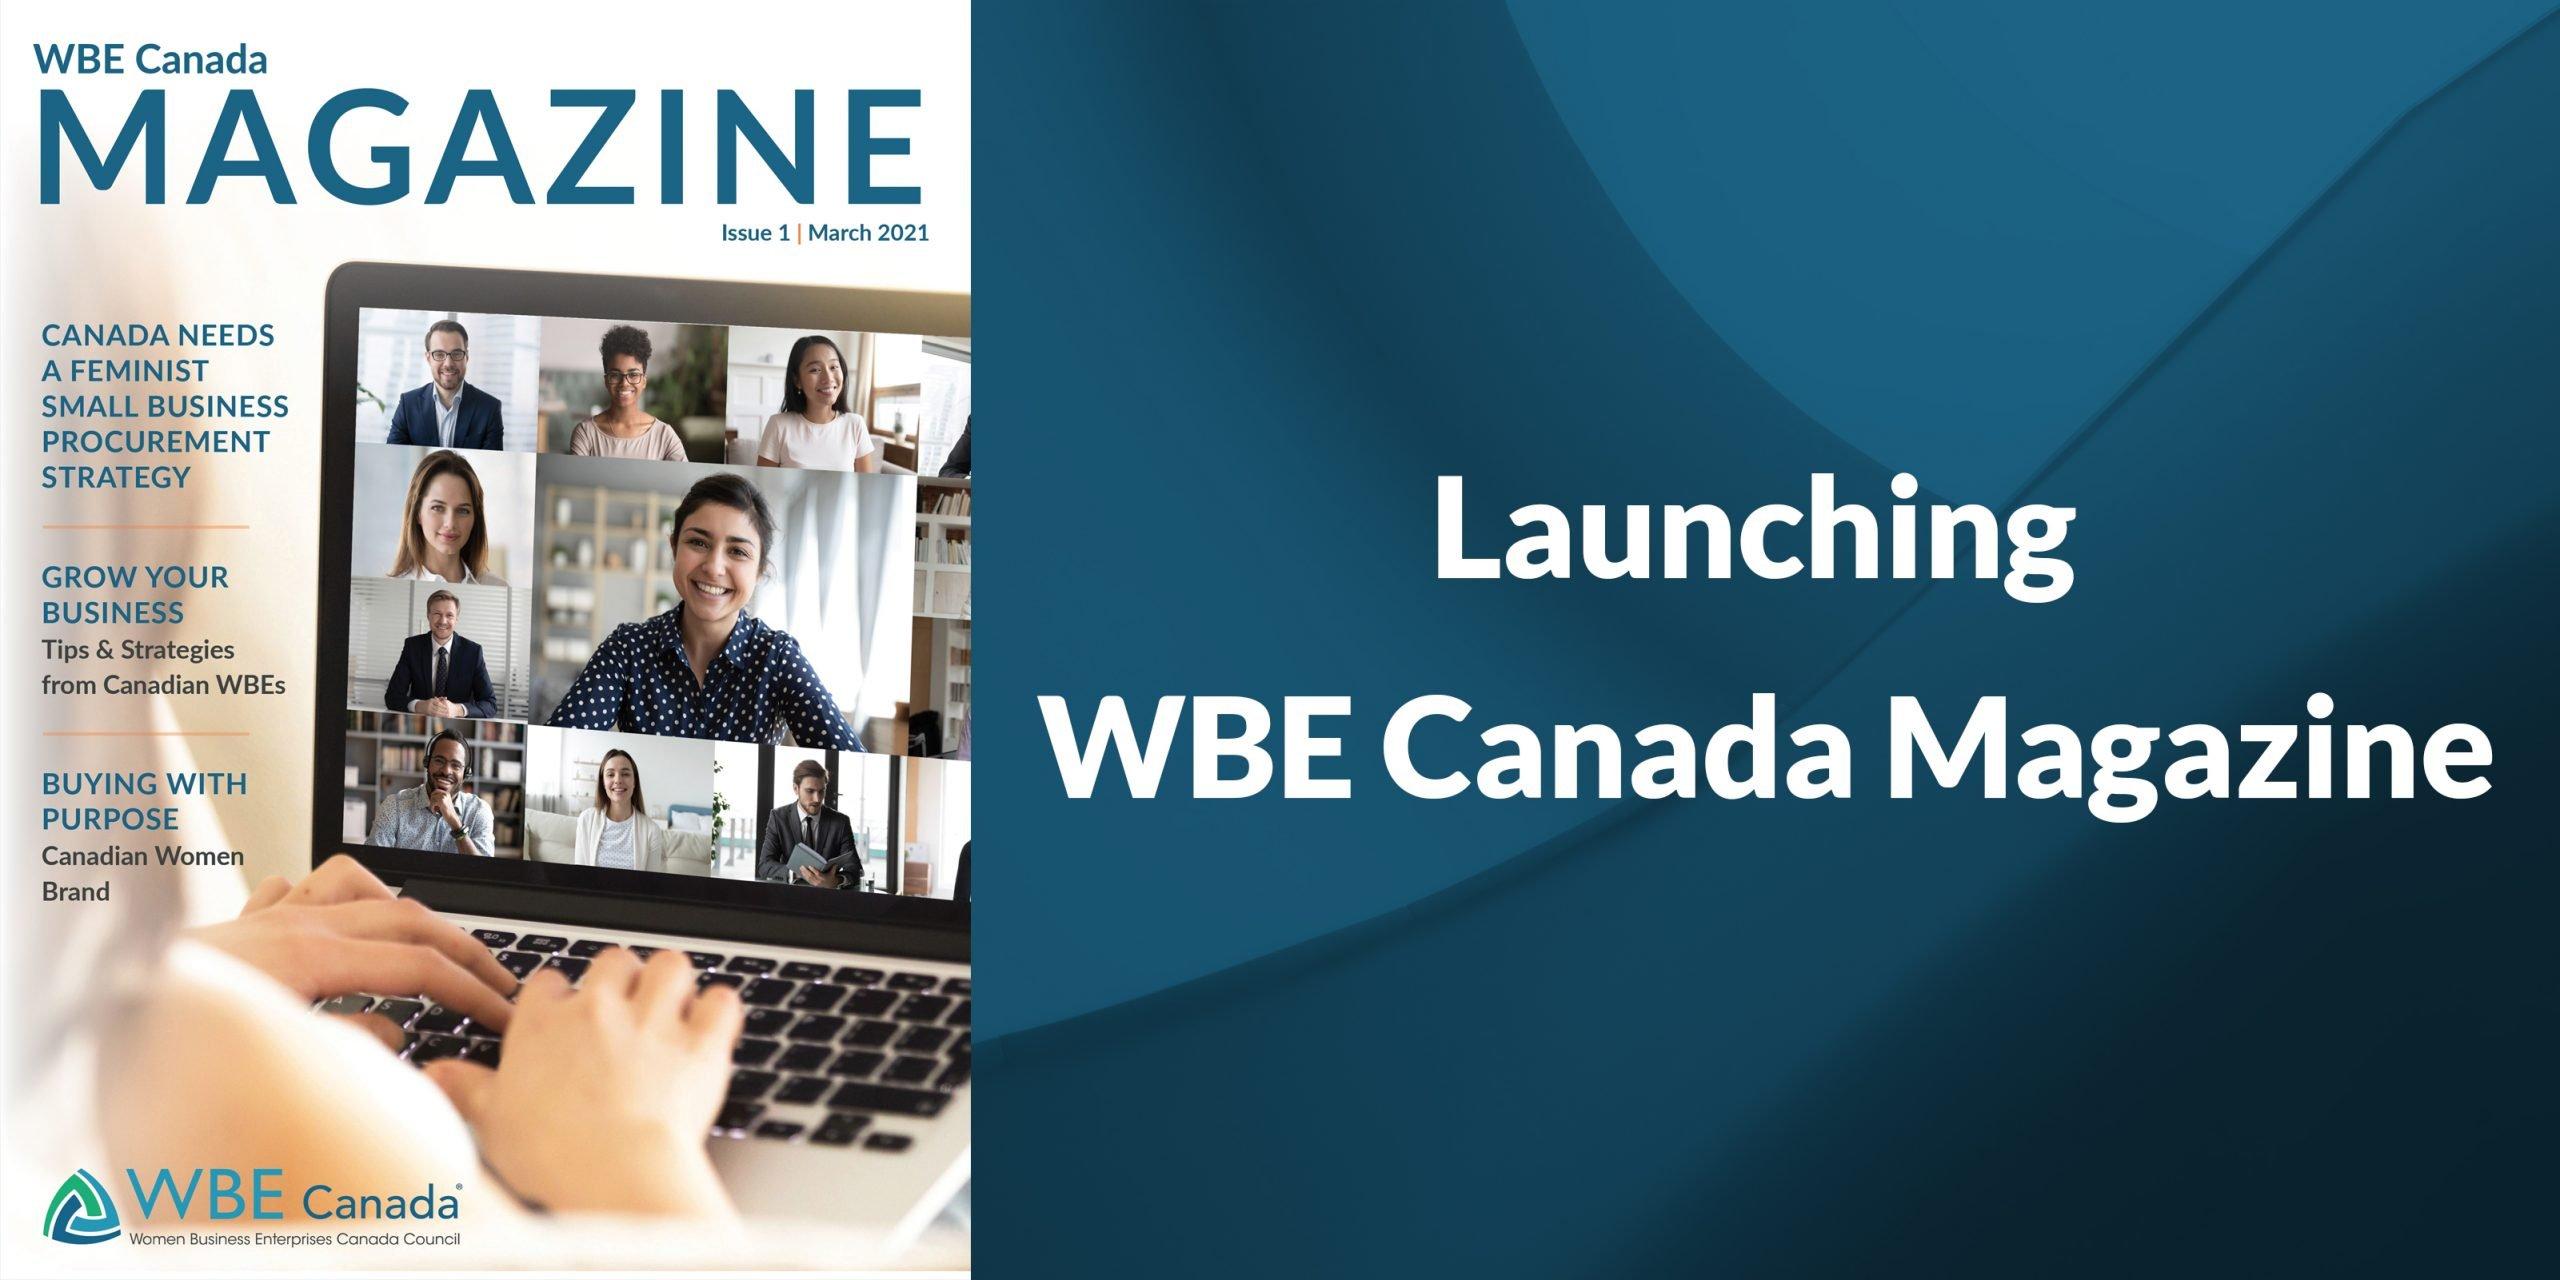 WBE Canada Magazine launch